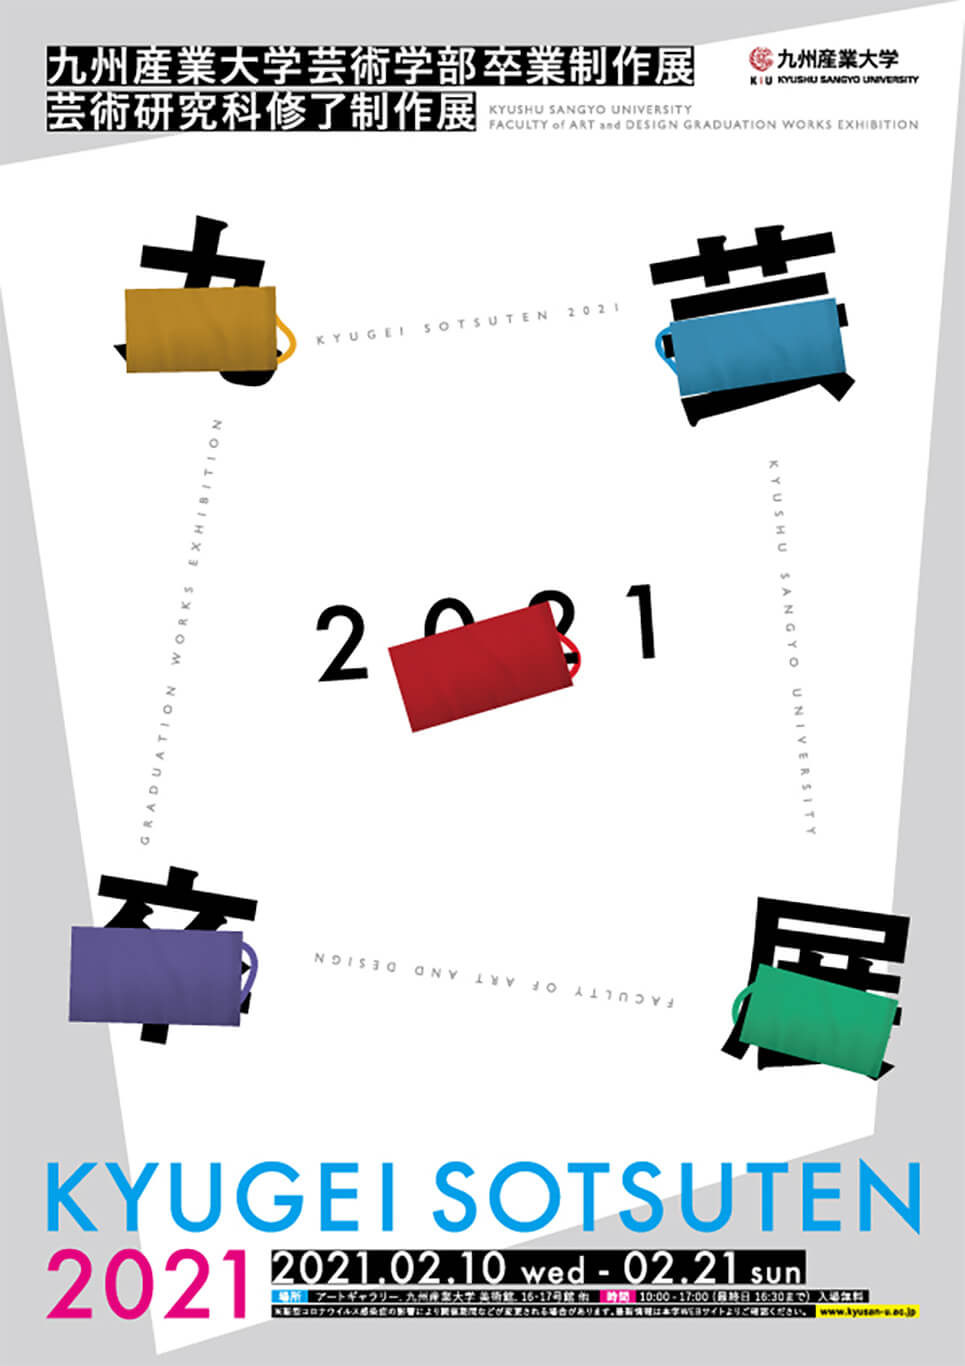 mksu-202102-九州産業大学芸術学部・大学院芸術研究科 卒業・修了作品展